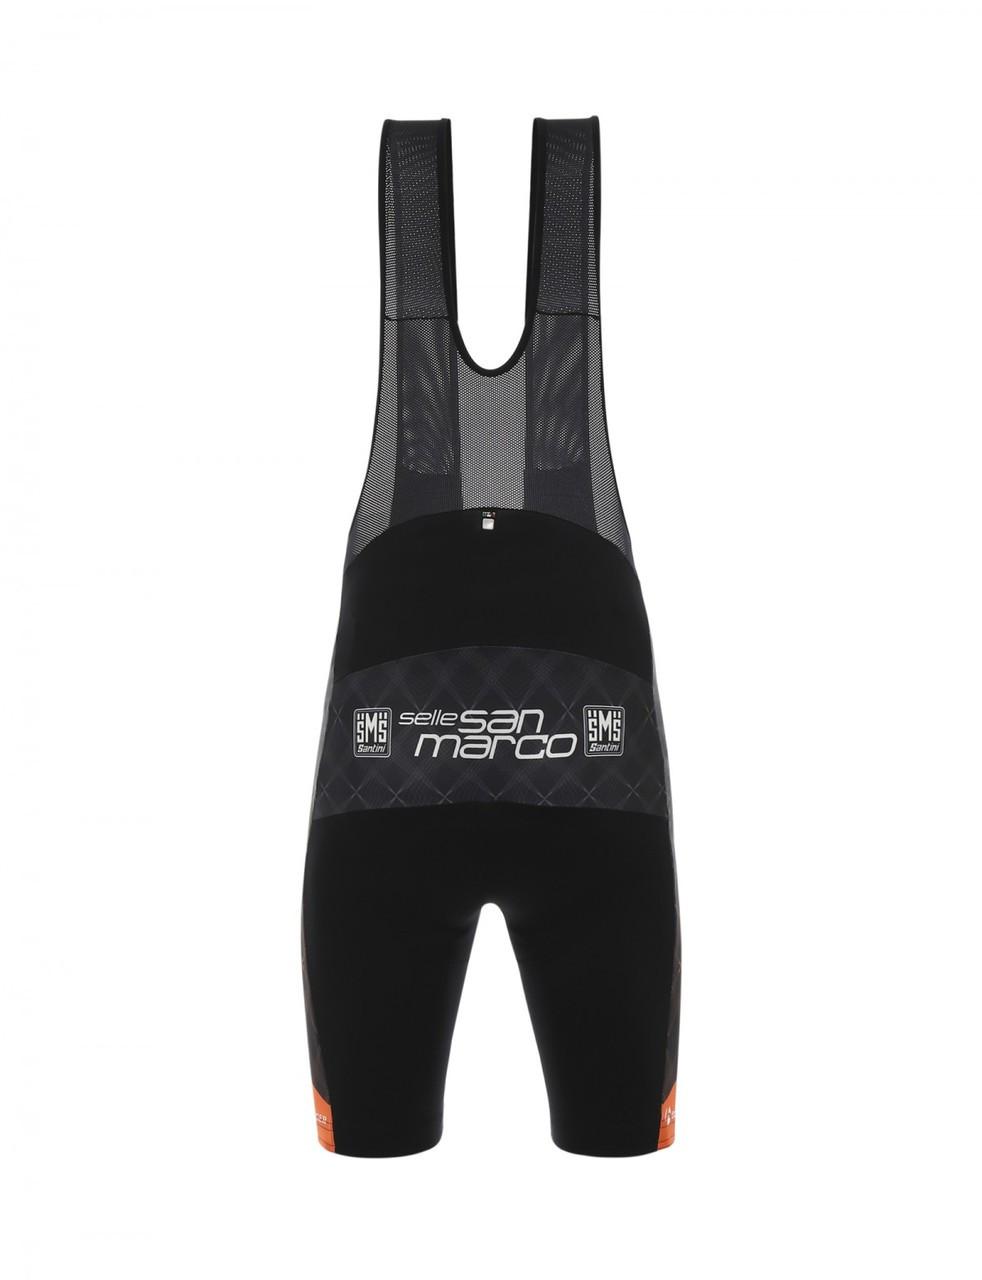 2017 Trek San Marco Bib Shorts Rear